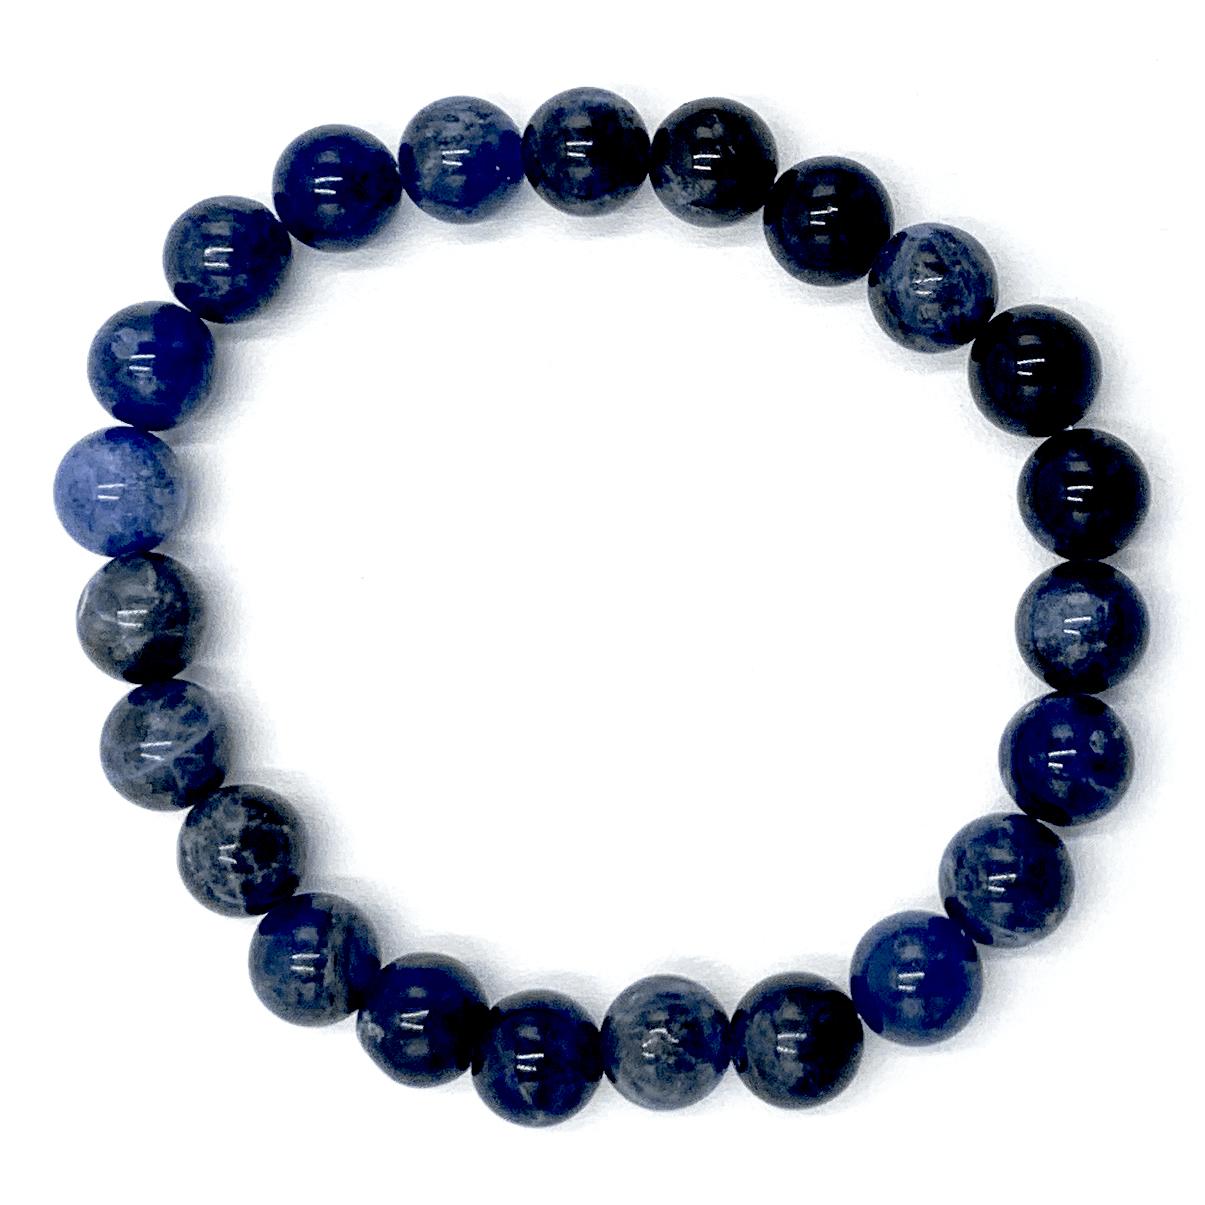 Bracelet Lapis Lazuli & Sodalite Image